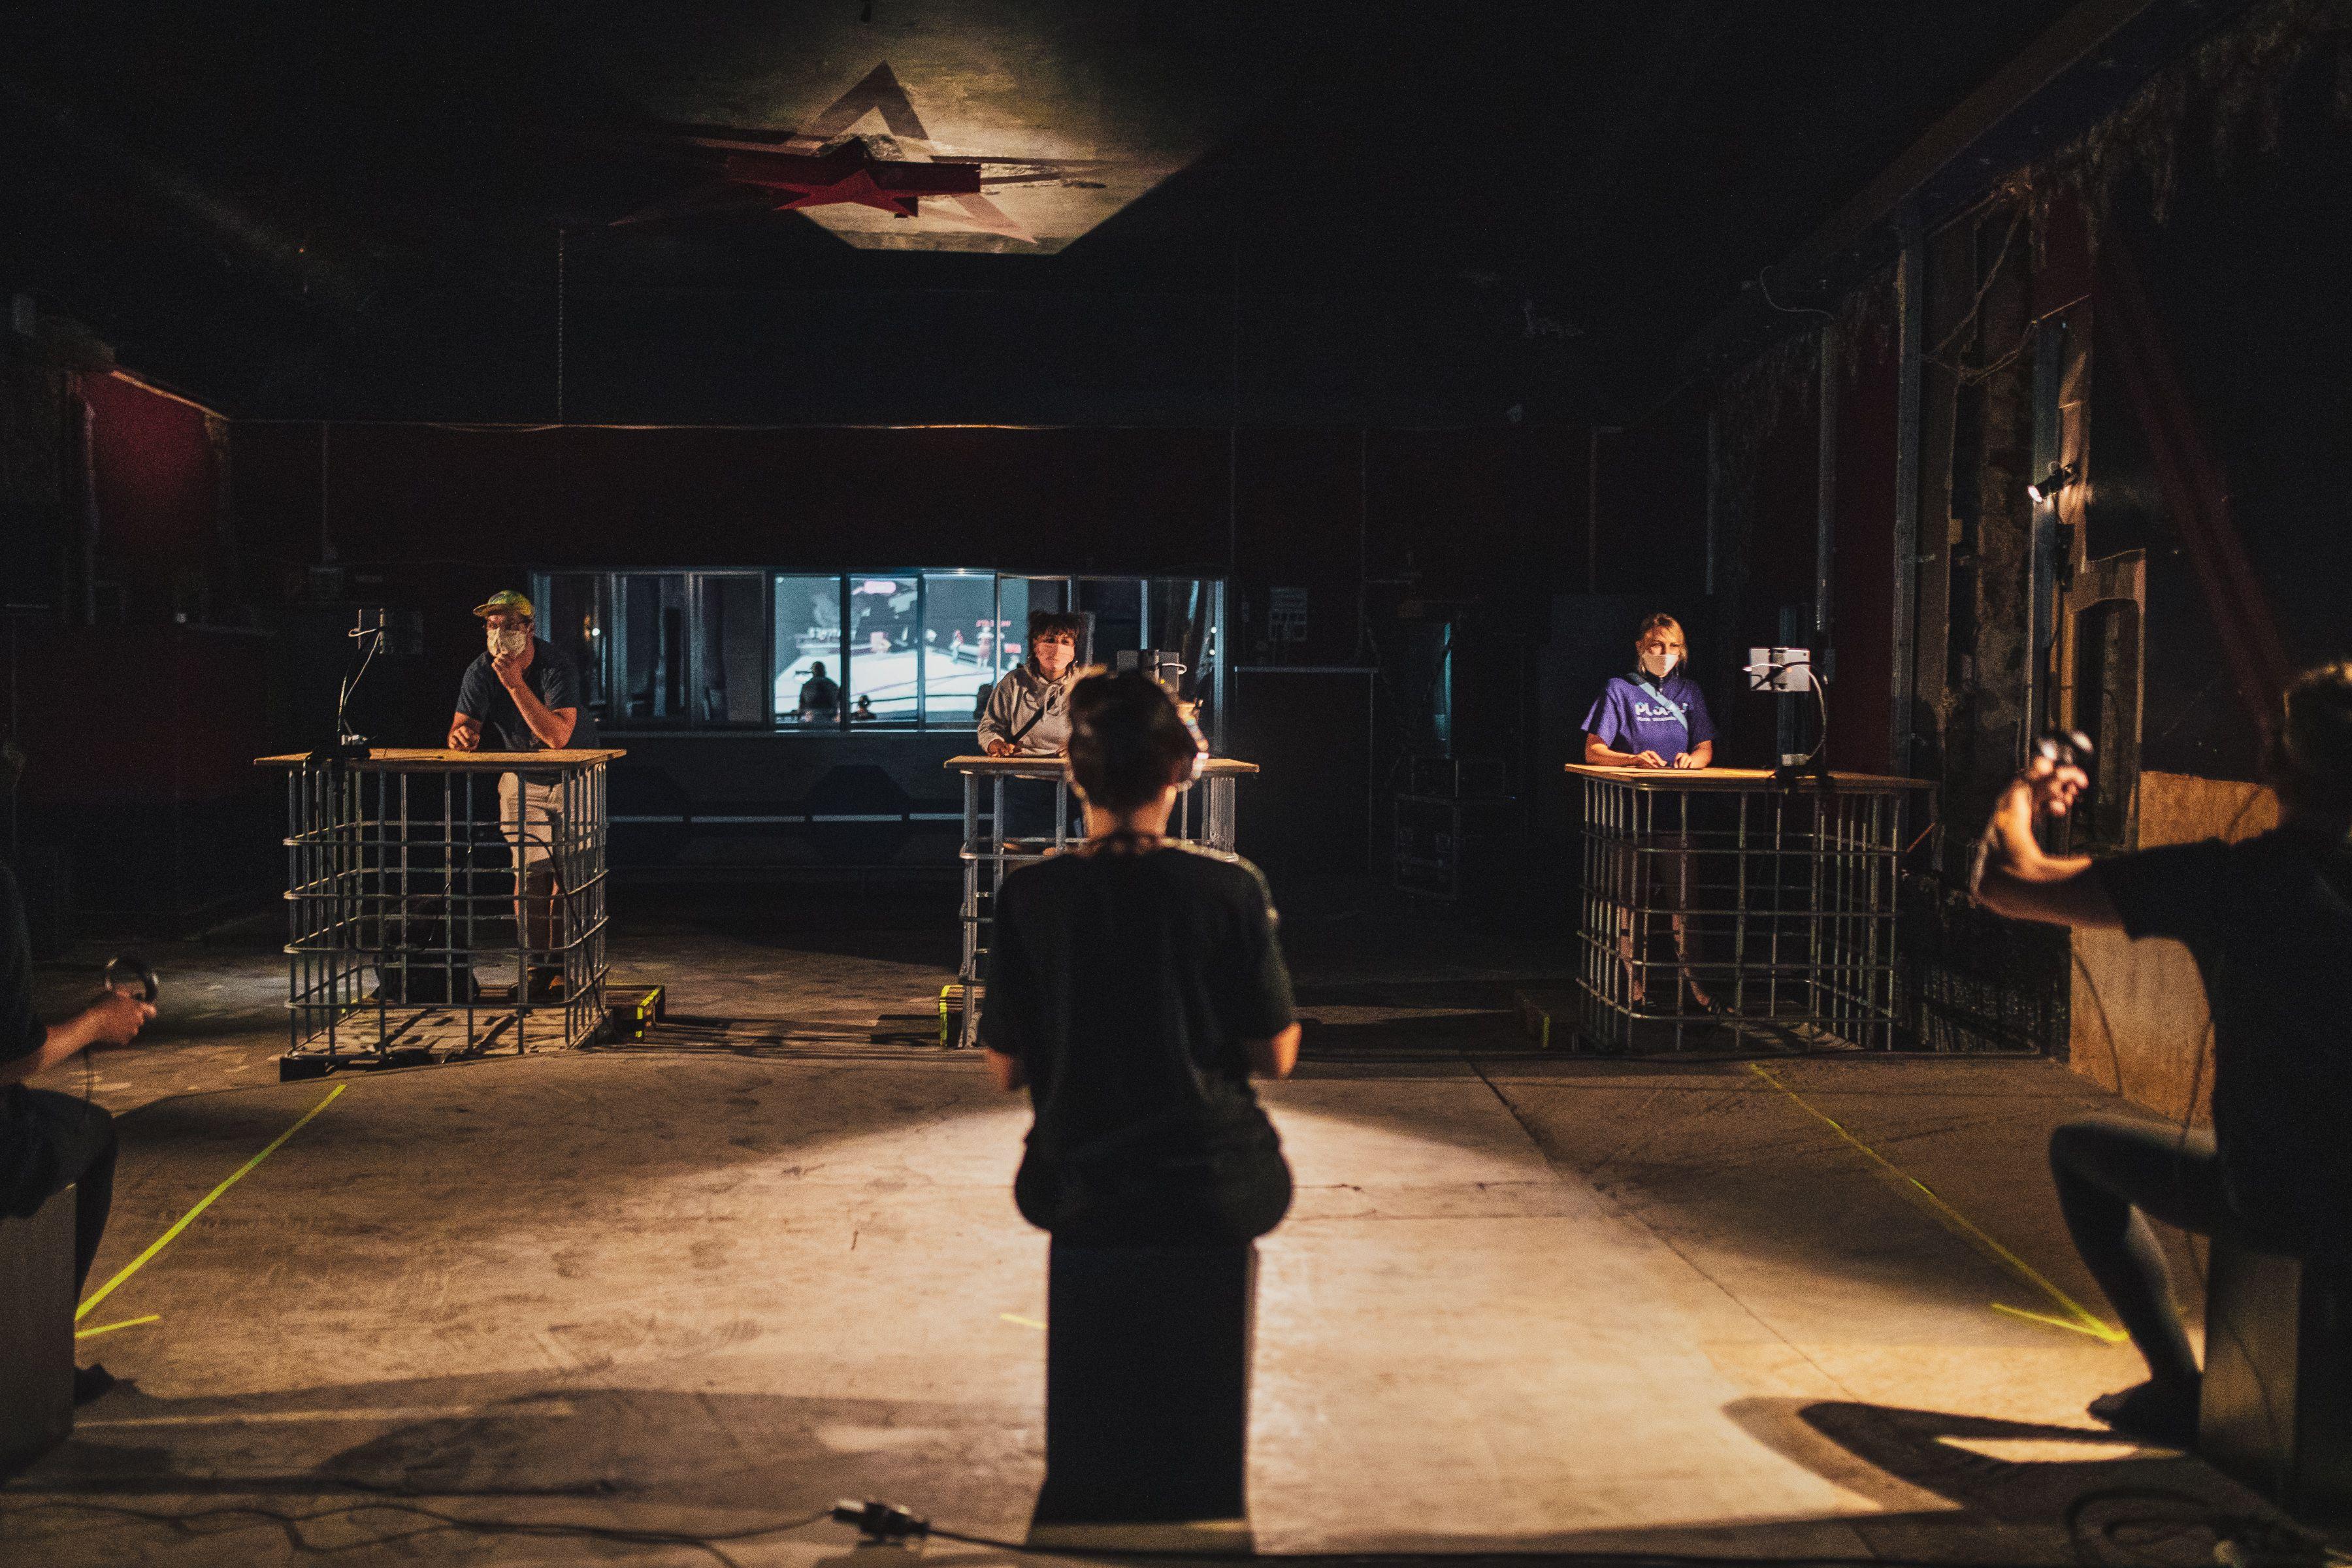 Places _ VR Festival Foto: Ravi Sejk